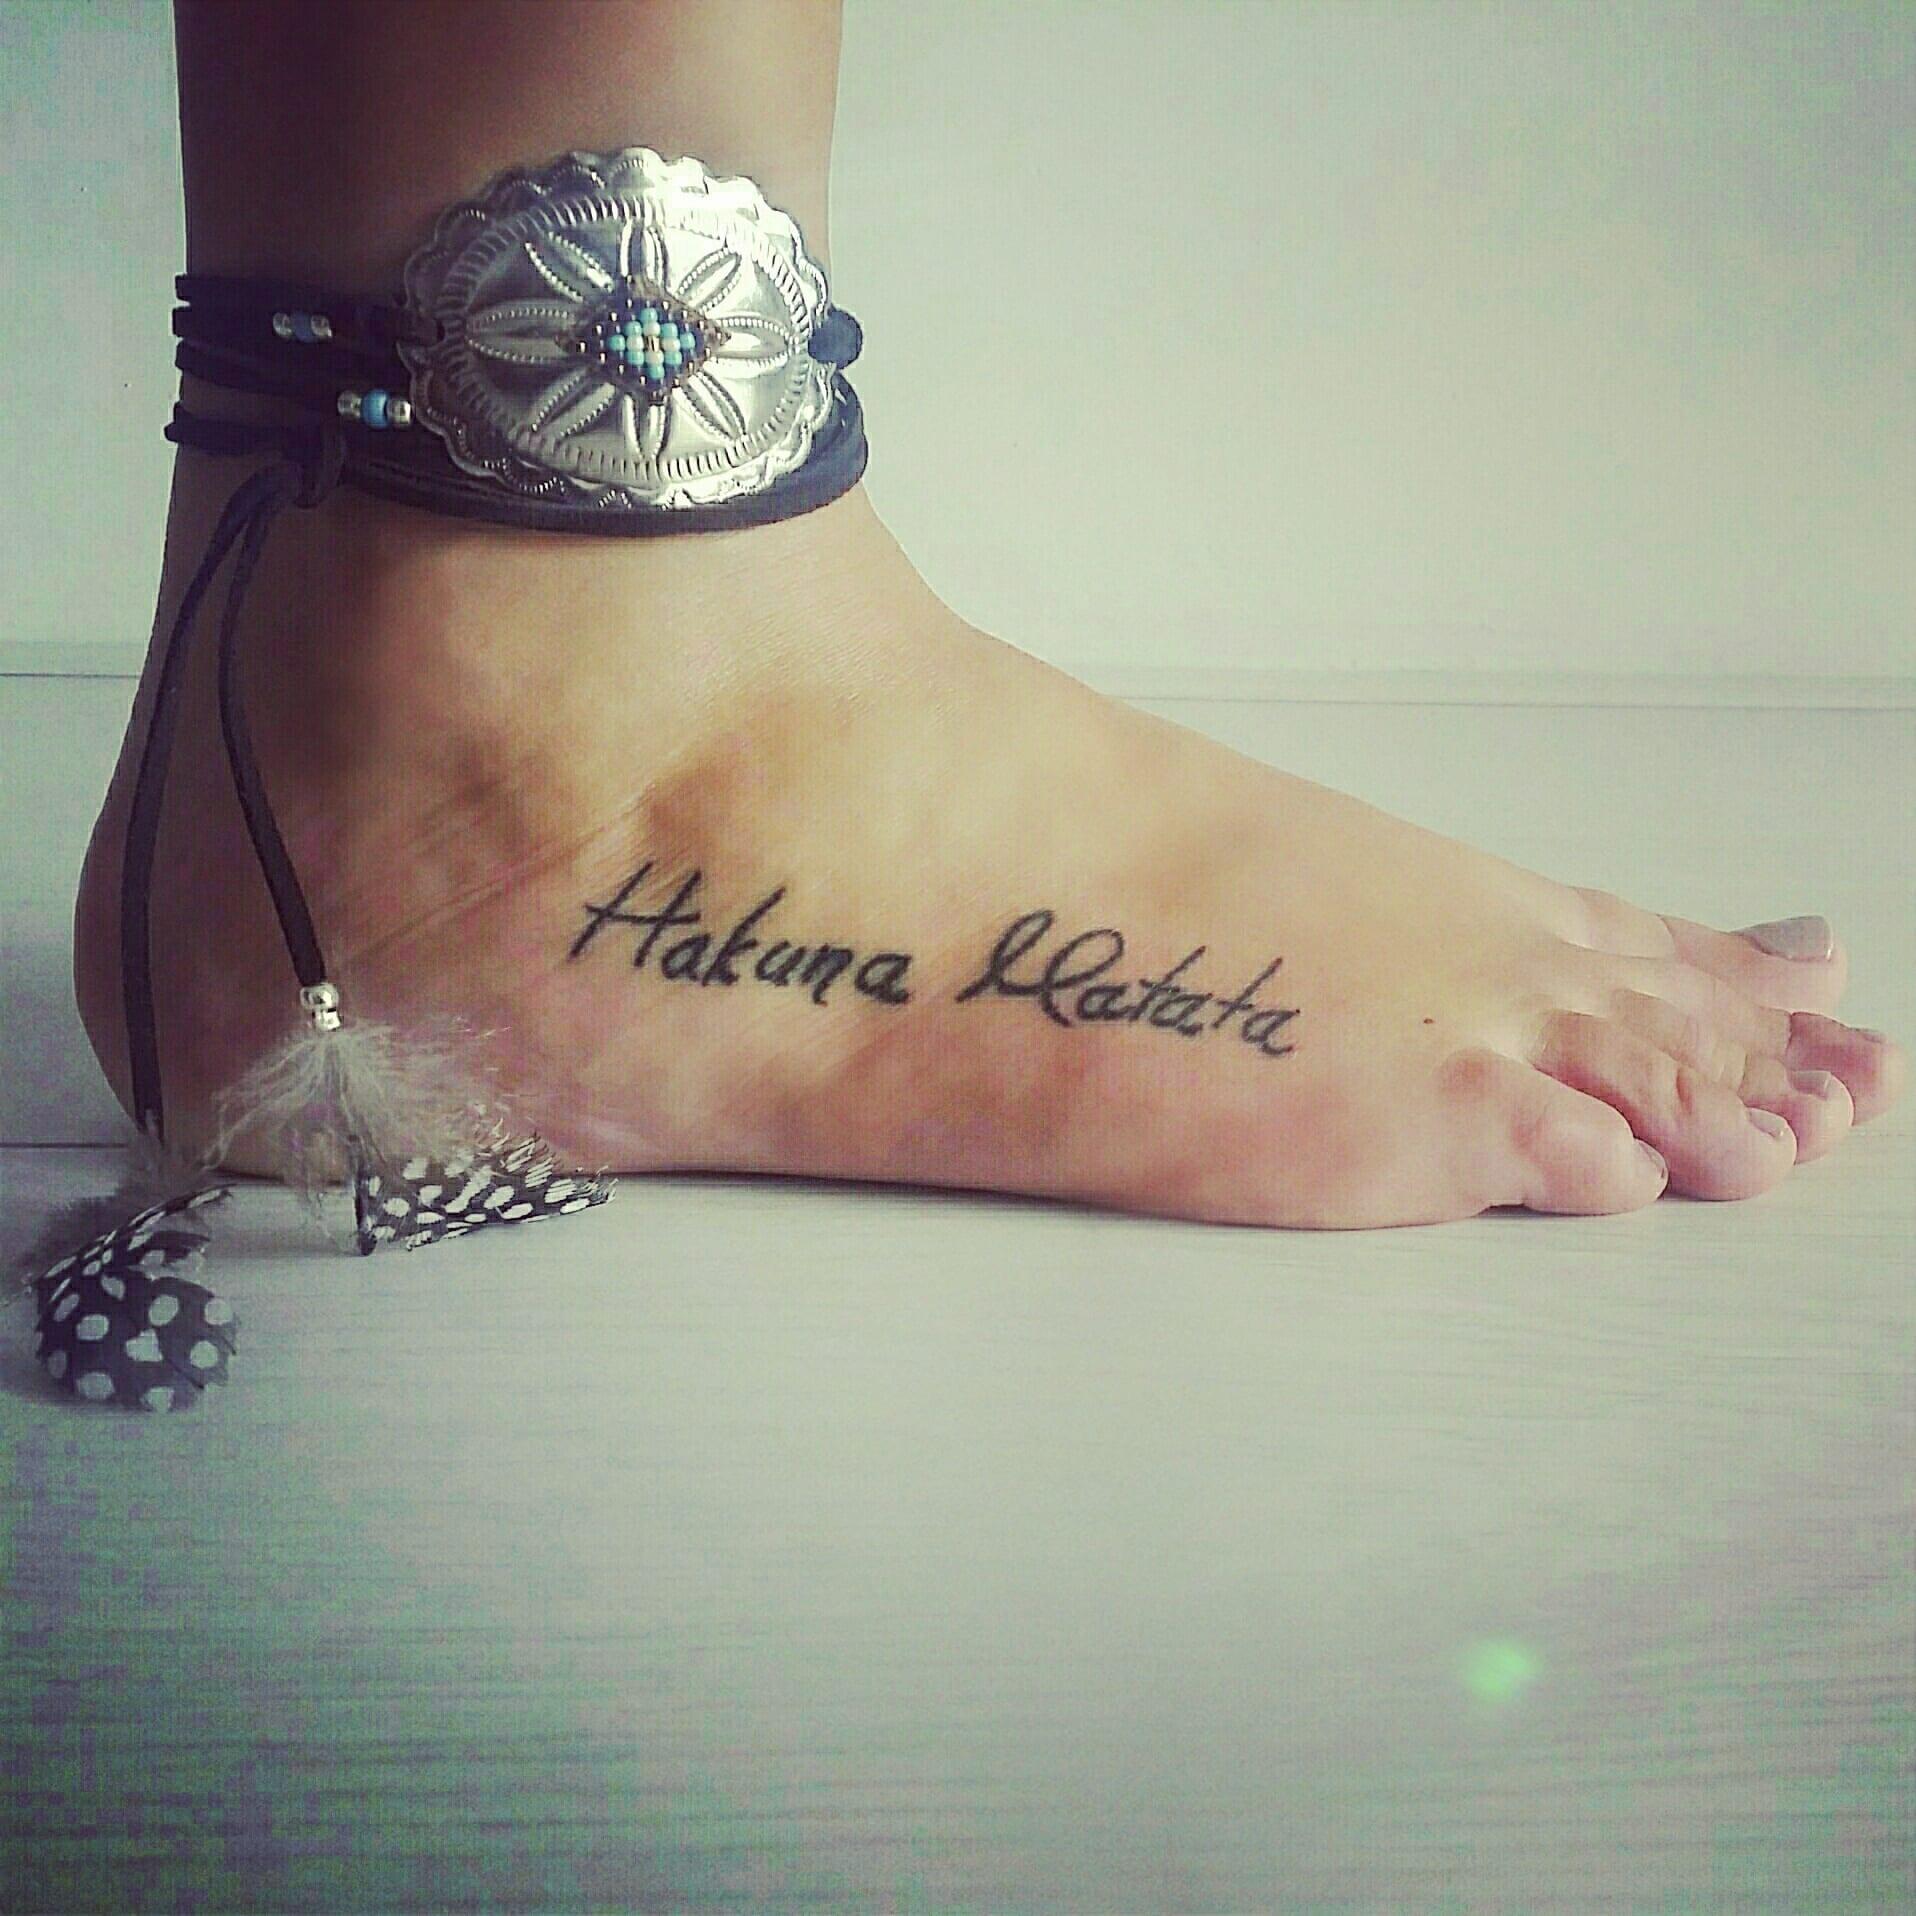 Estupendos Tatuajes De Hakuna Matata